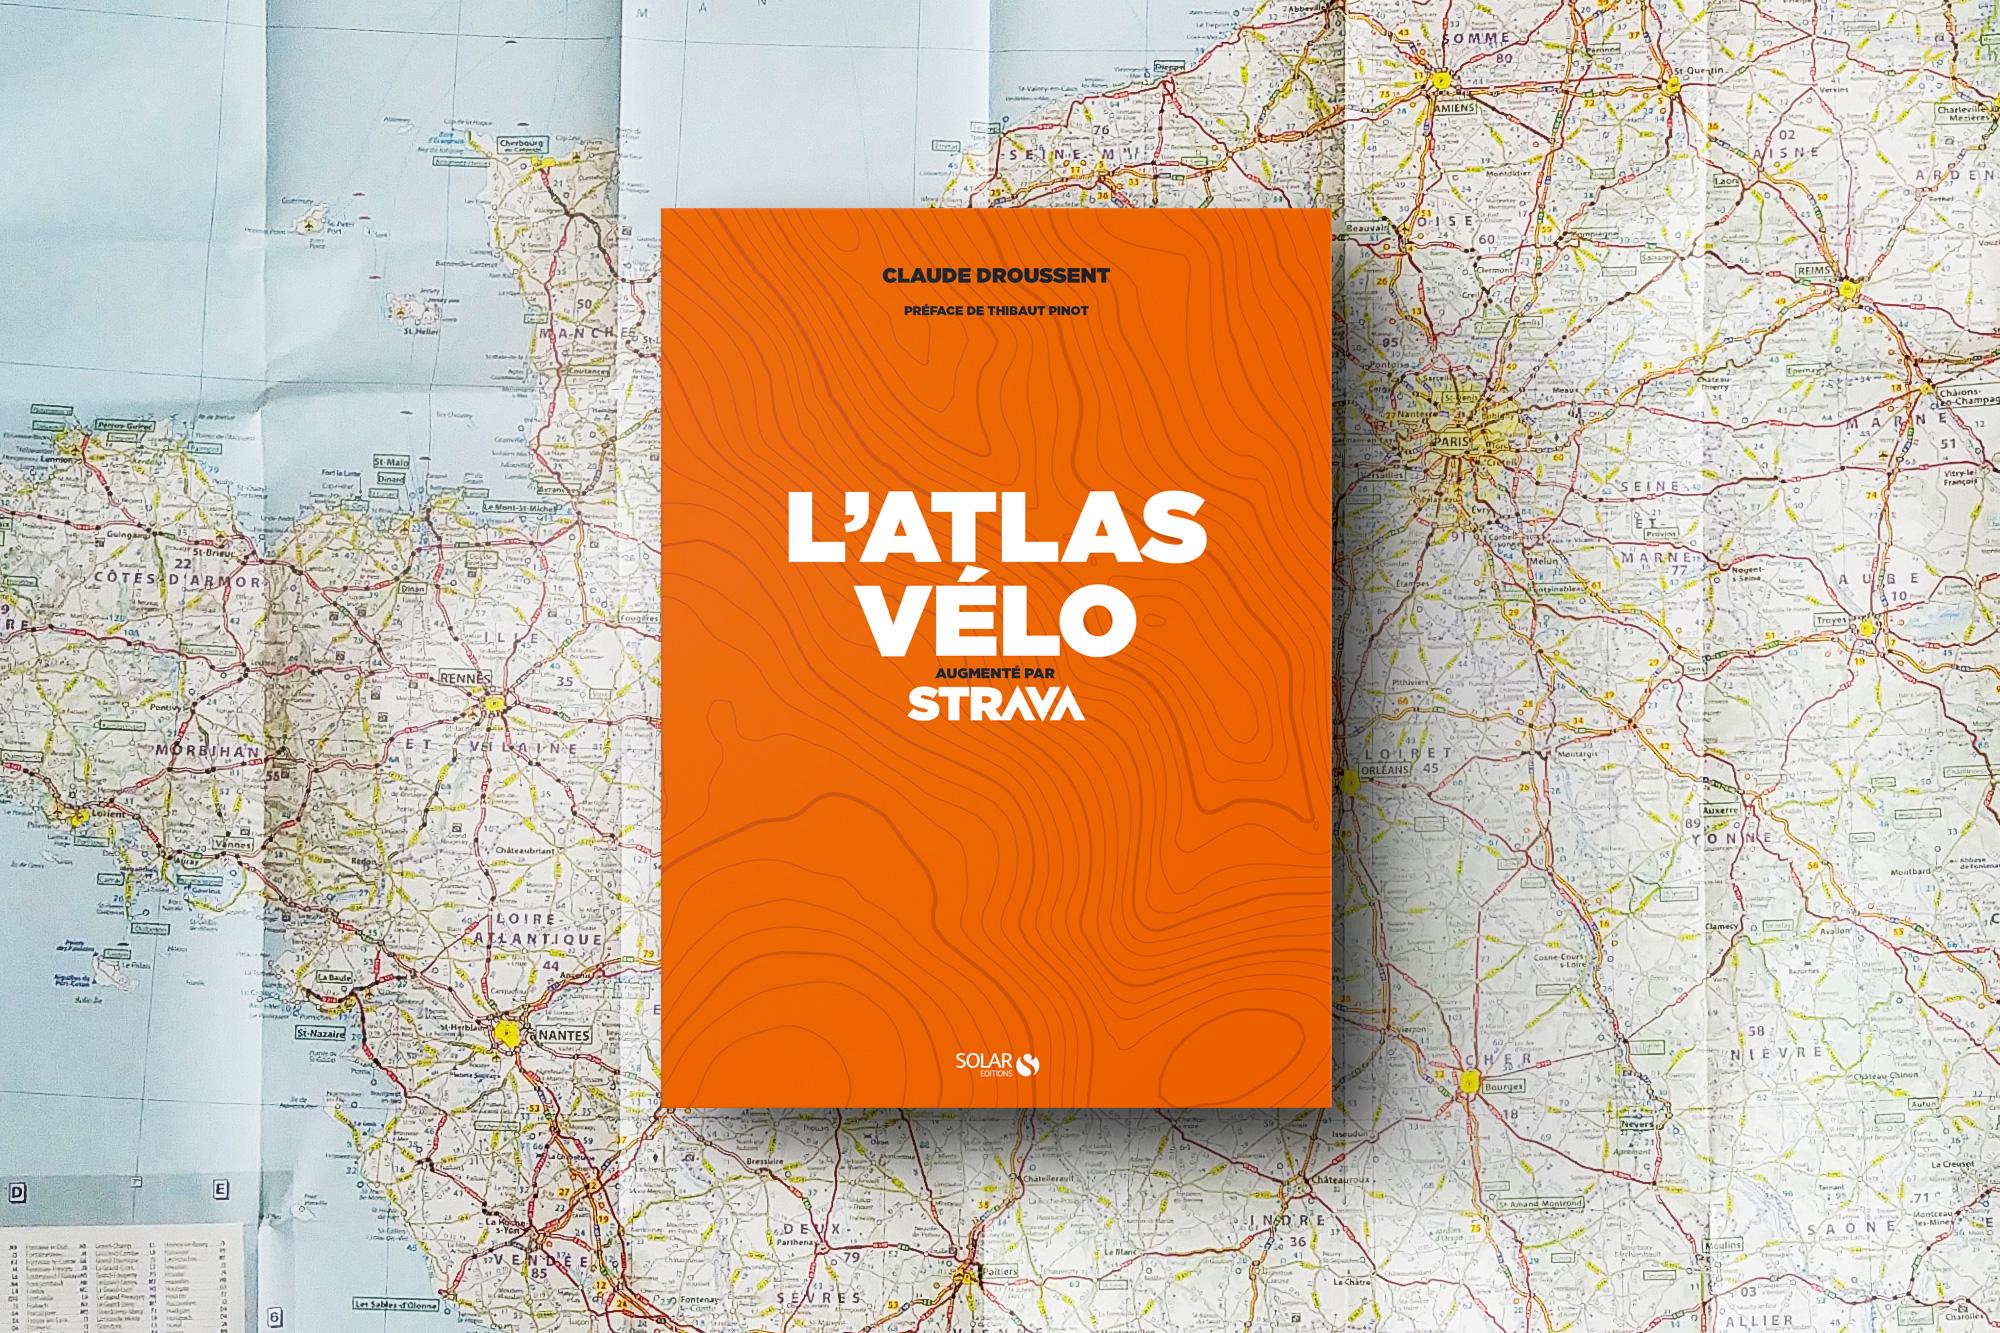 atlas vélo appli strava randonnée cyclotourisme